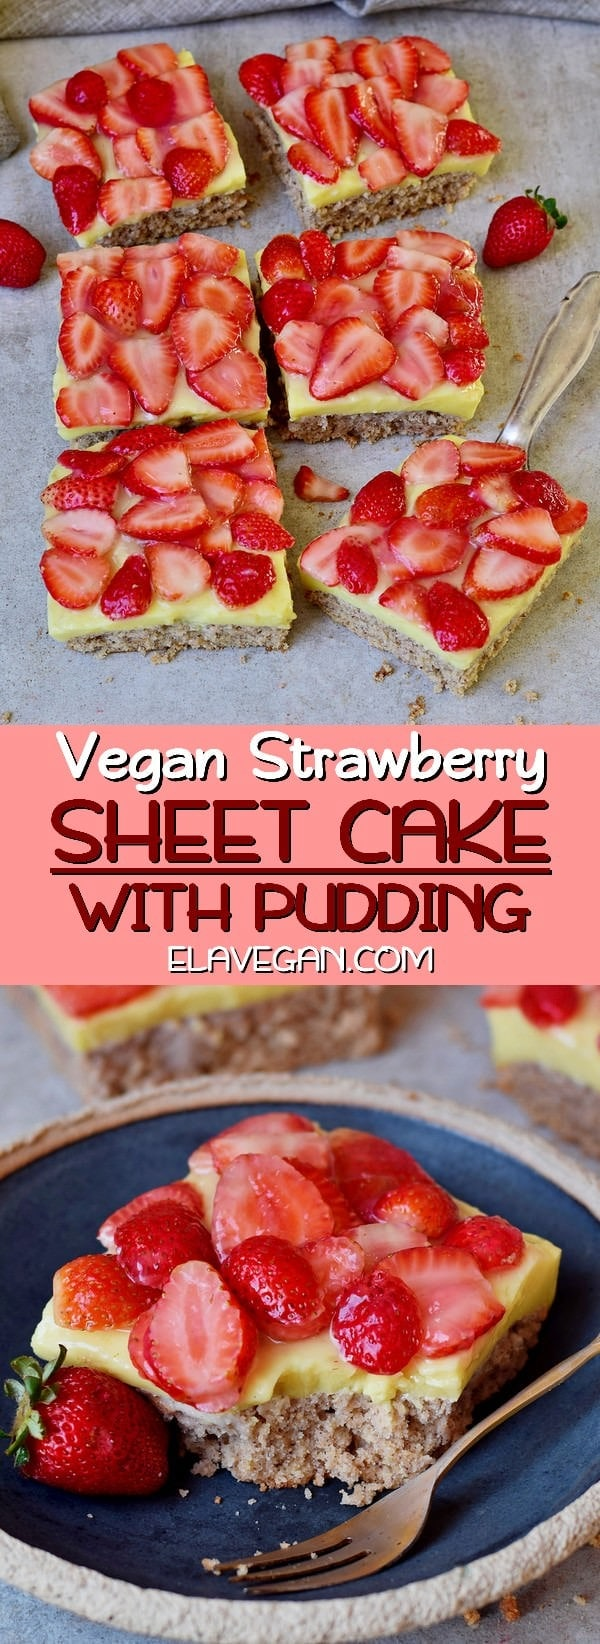 Vegan Strawberry sheet cake with pudding